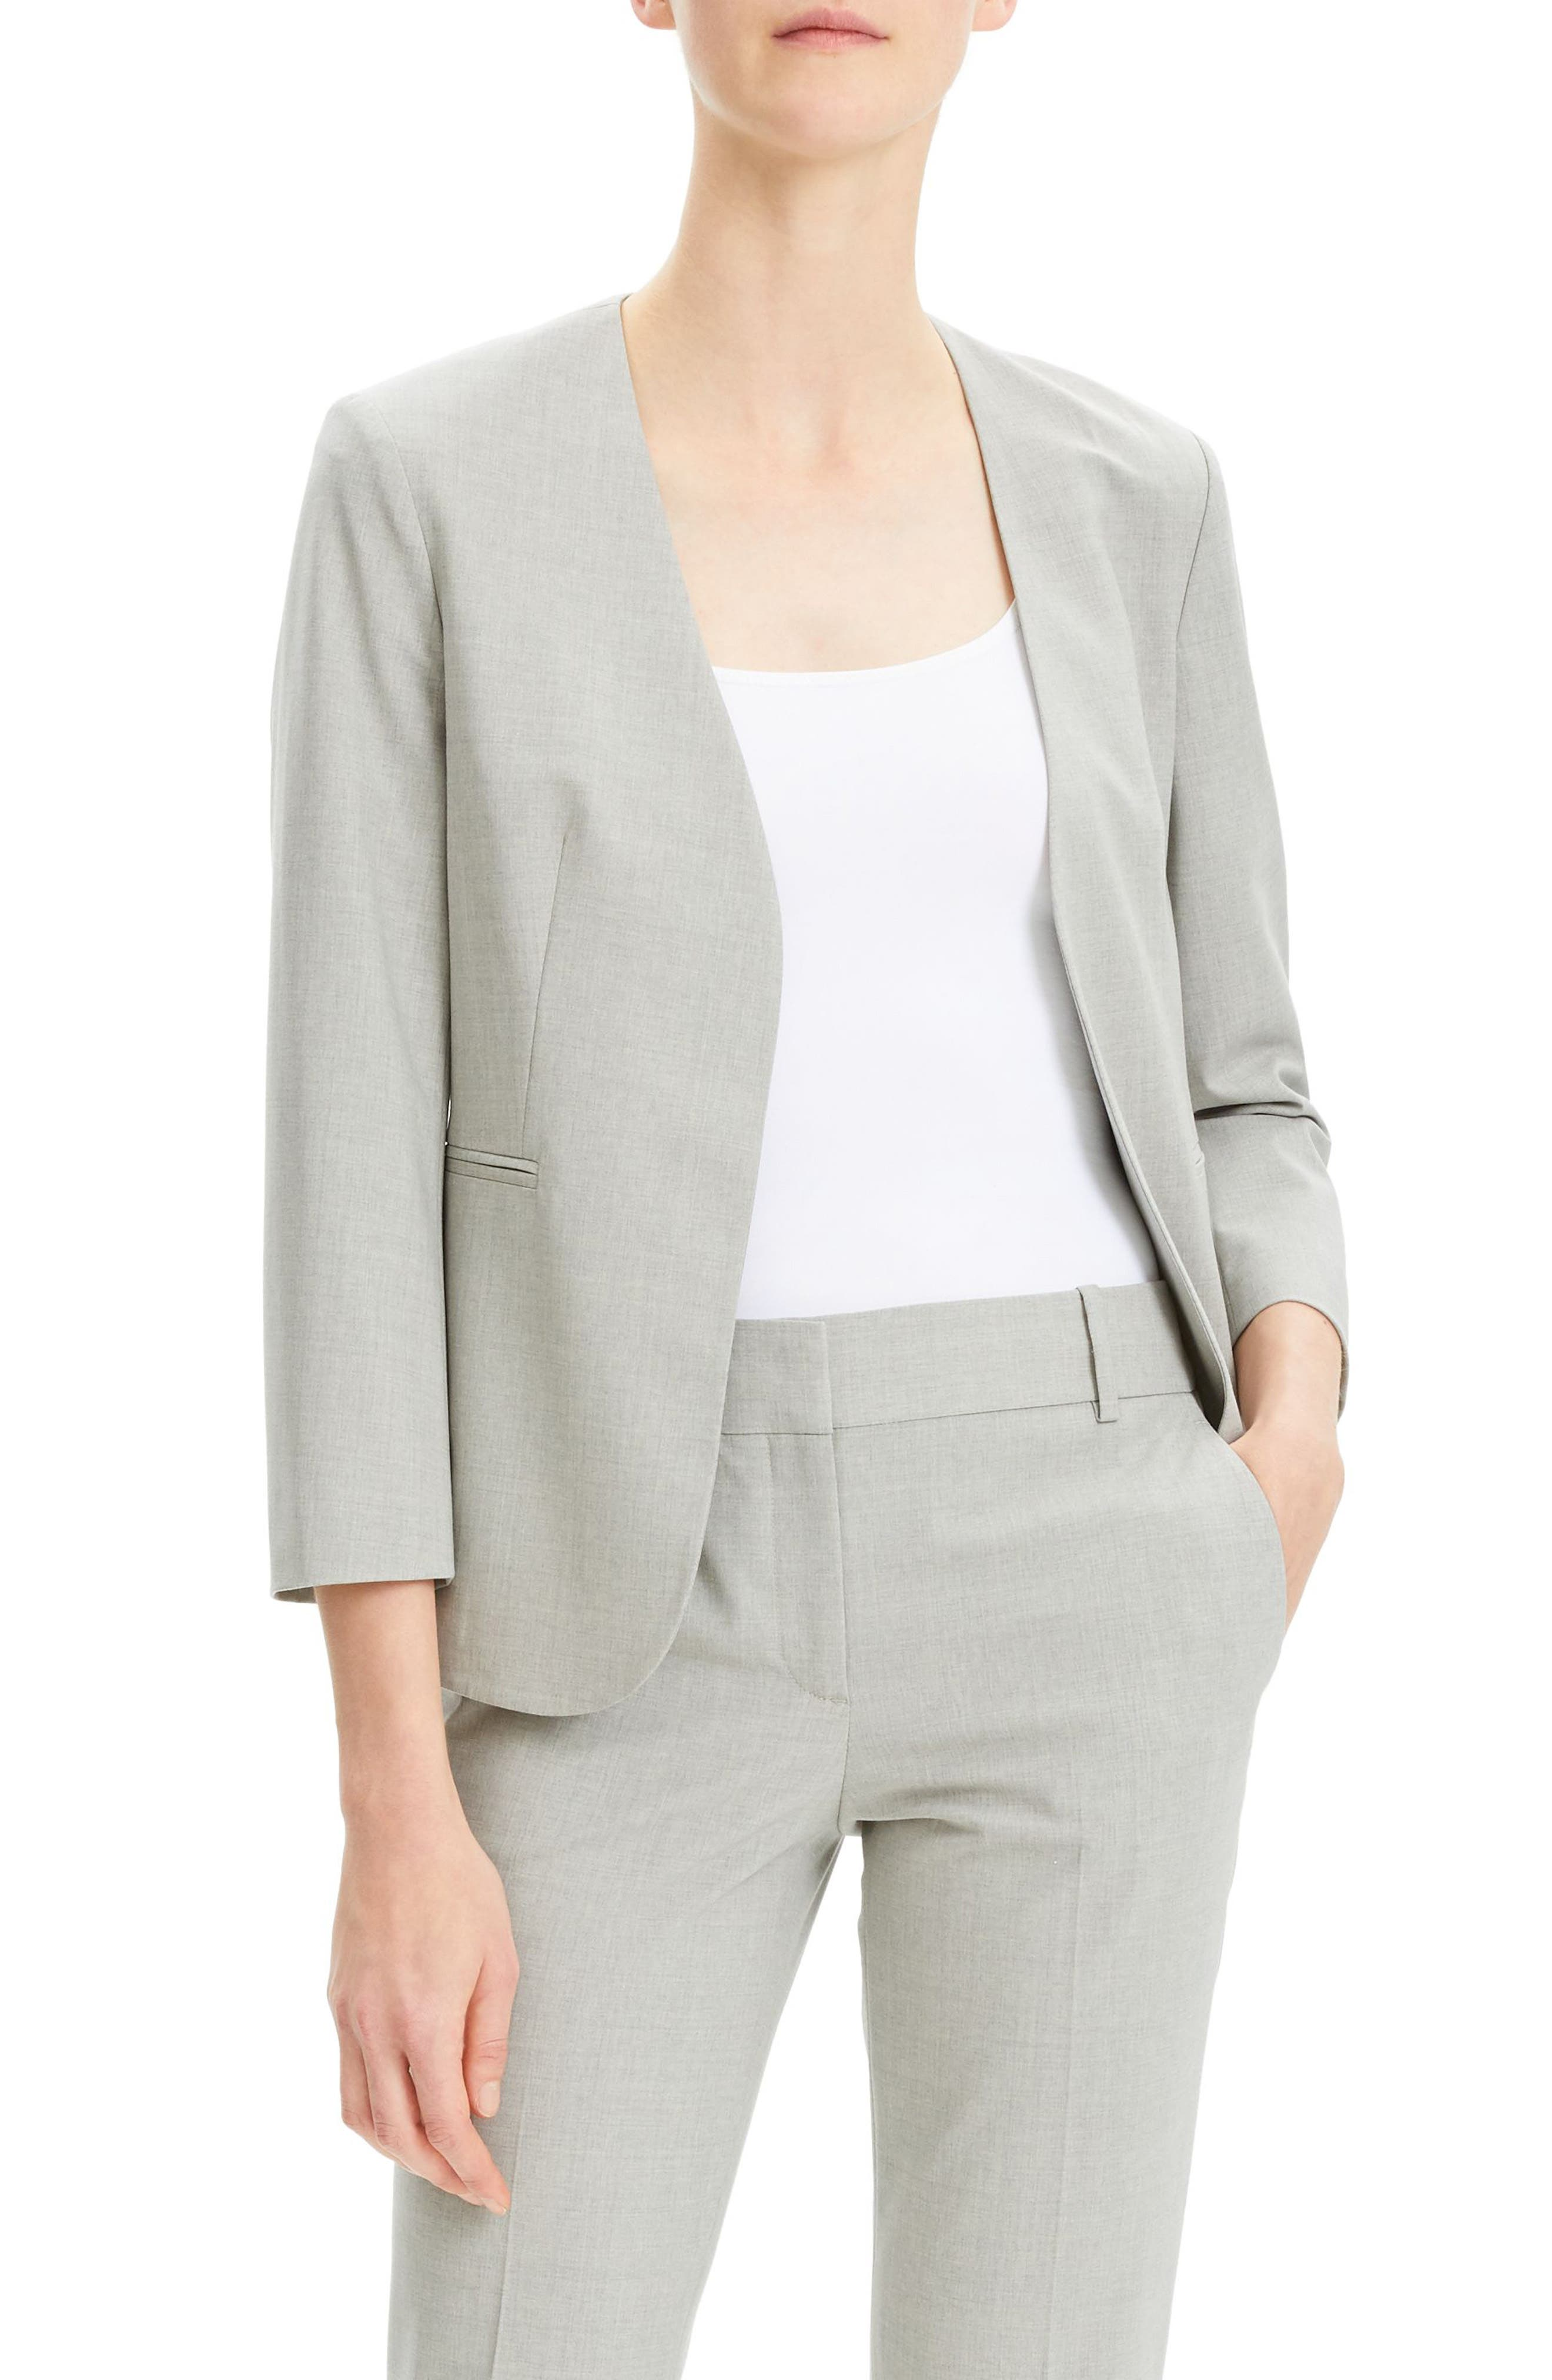 THEORY Lindrayia B Good Wool Suit Jacket, Main, color, LIGHT GREY MELANGE